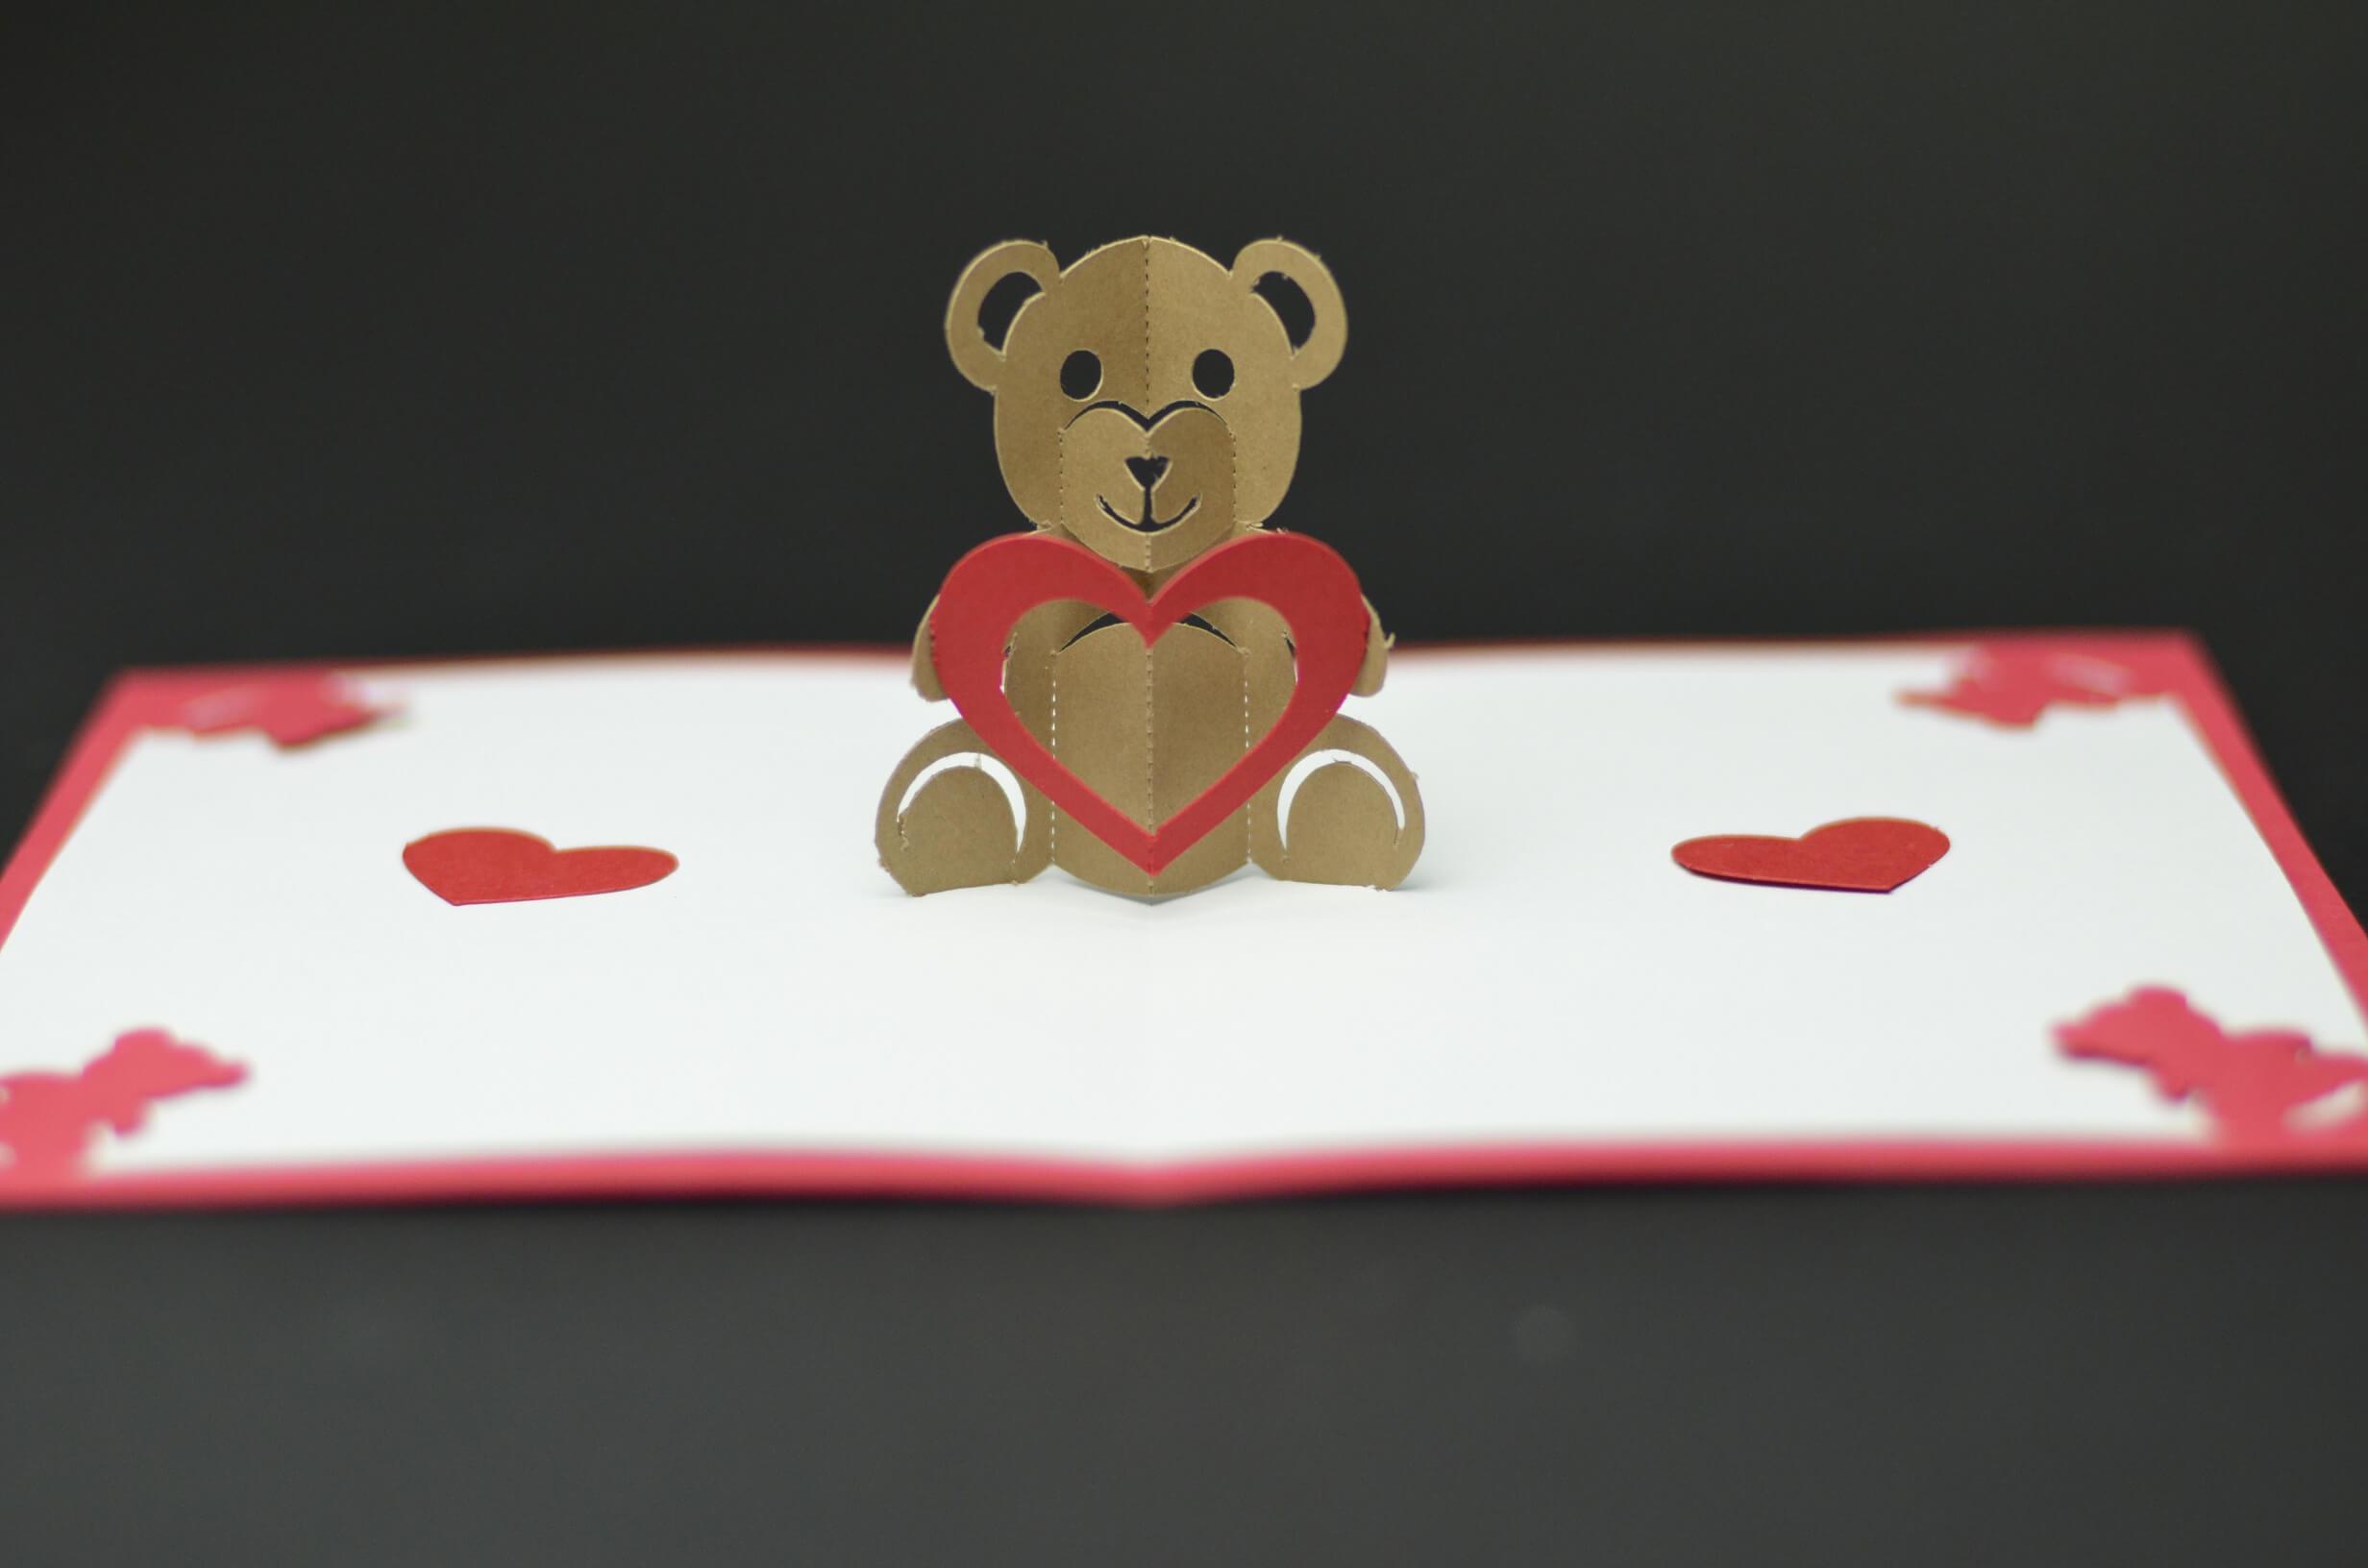 Pop Up Card Tutorials And Templates - Creative Pop Up Cards Pertaining To Diy Pop Up Cards Templates